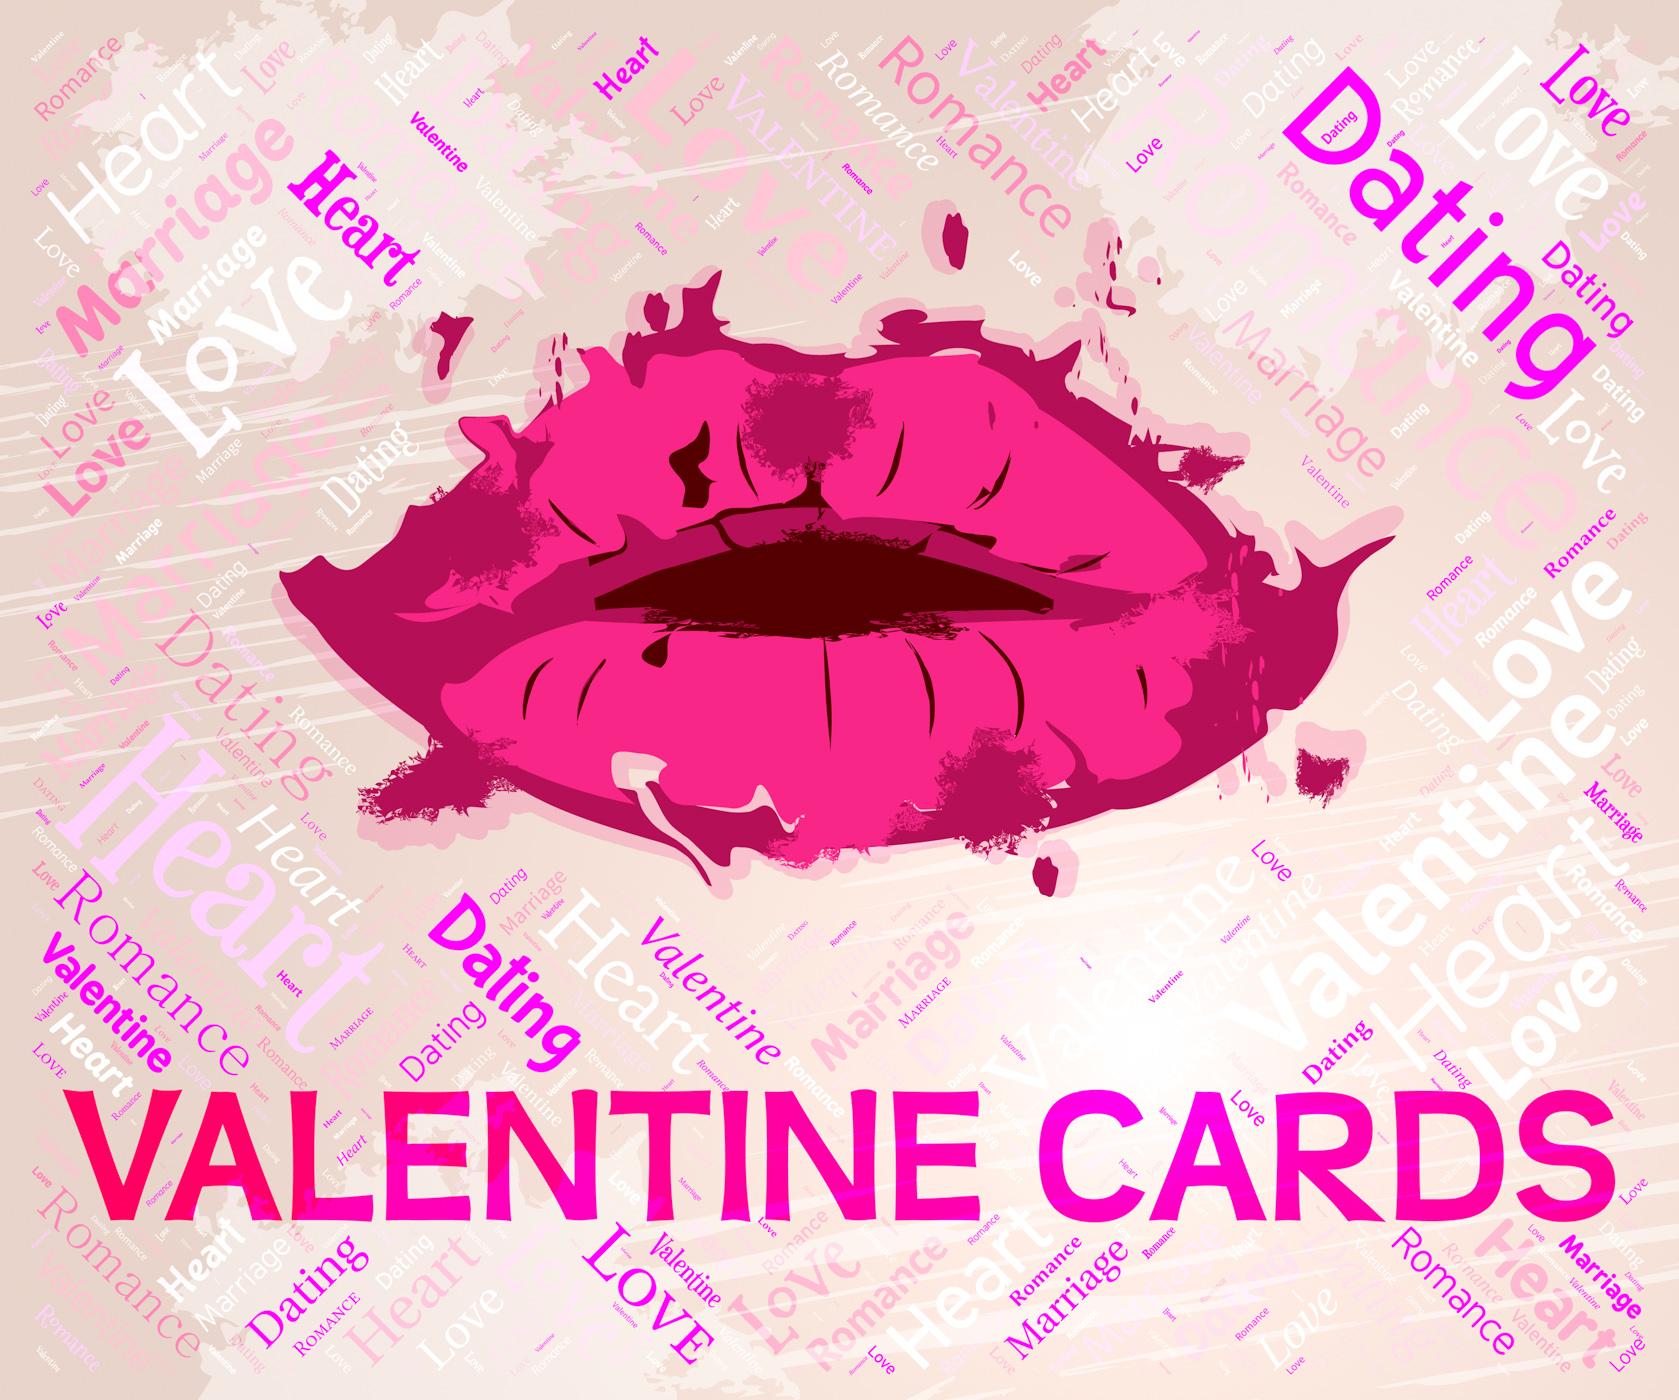 Valentine cards means valentines day and boyfriend photo